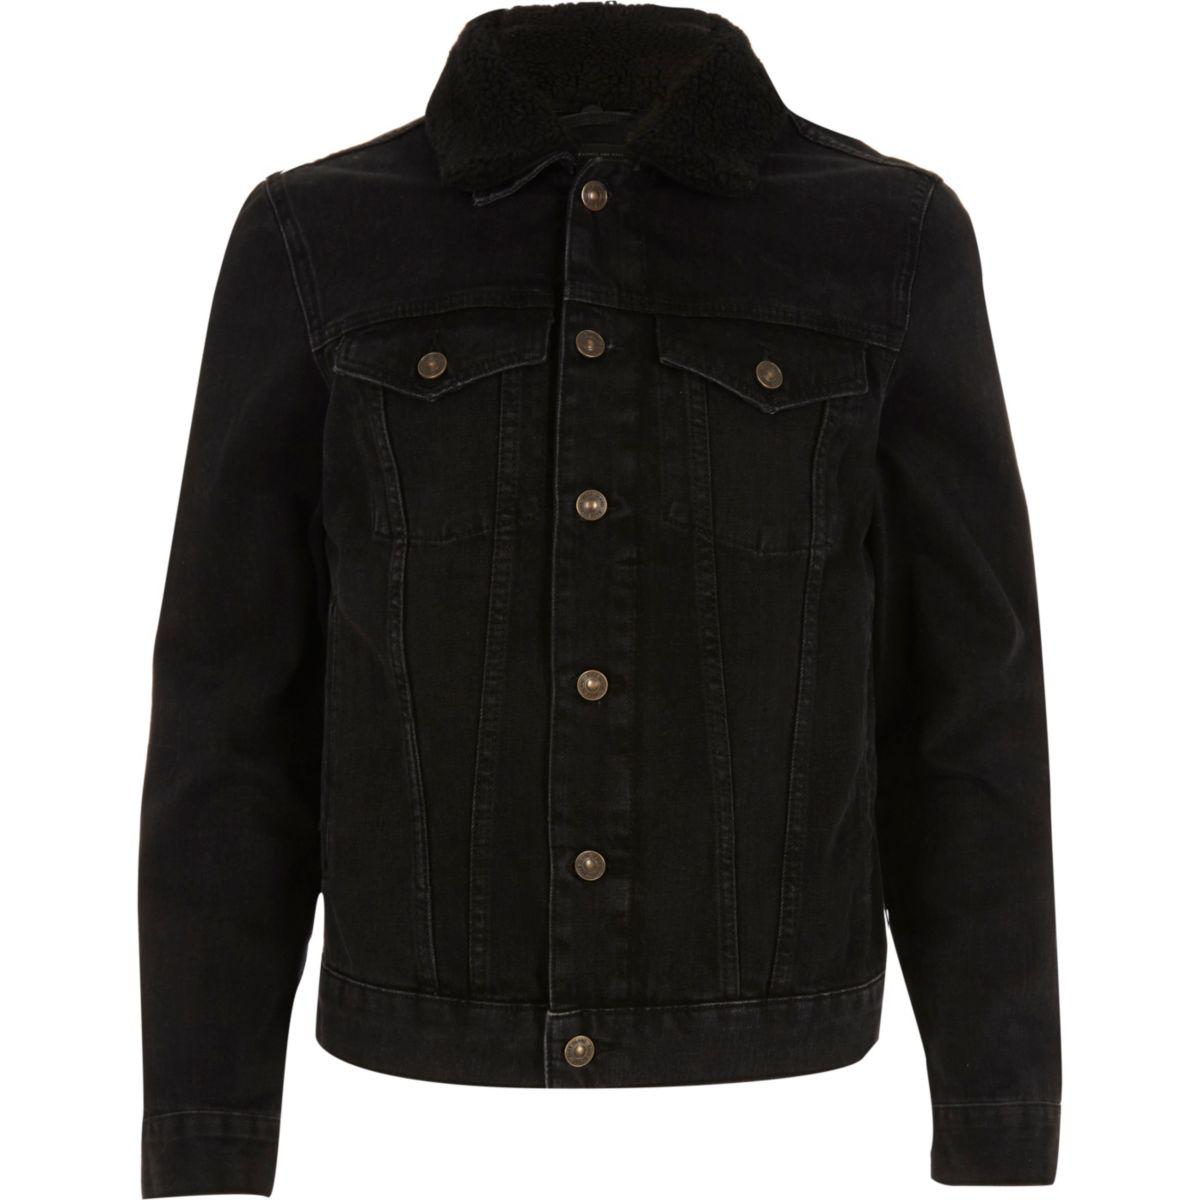 Black washed borg collar denim jacket - Coats & Jackets - Sale - men